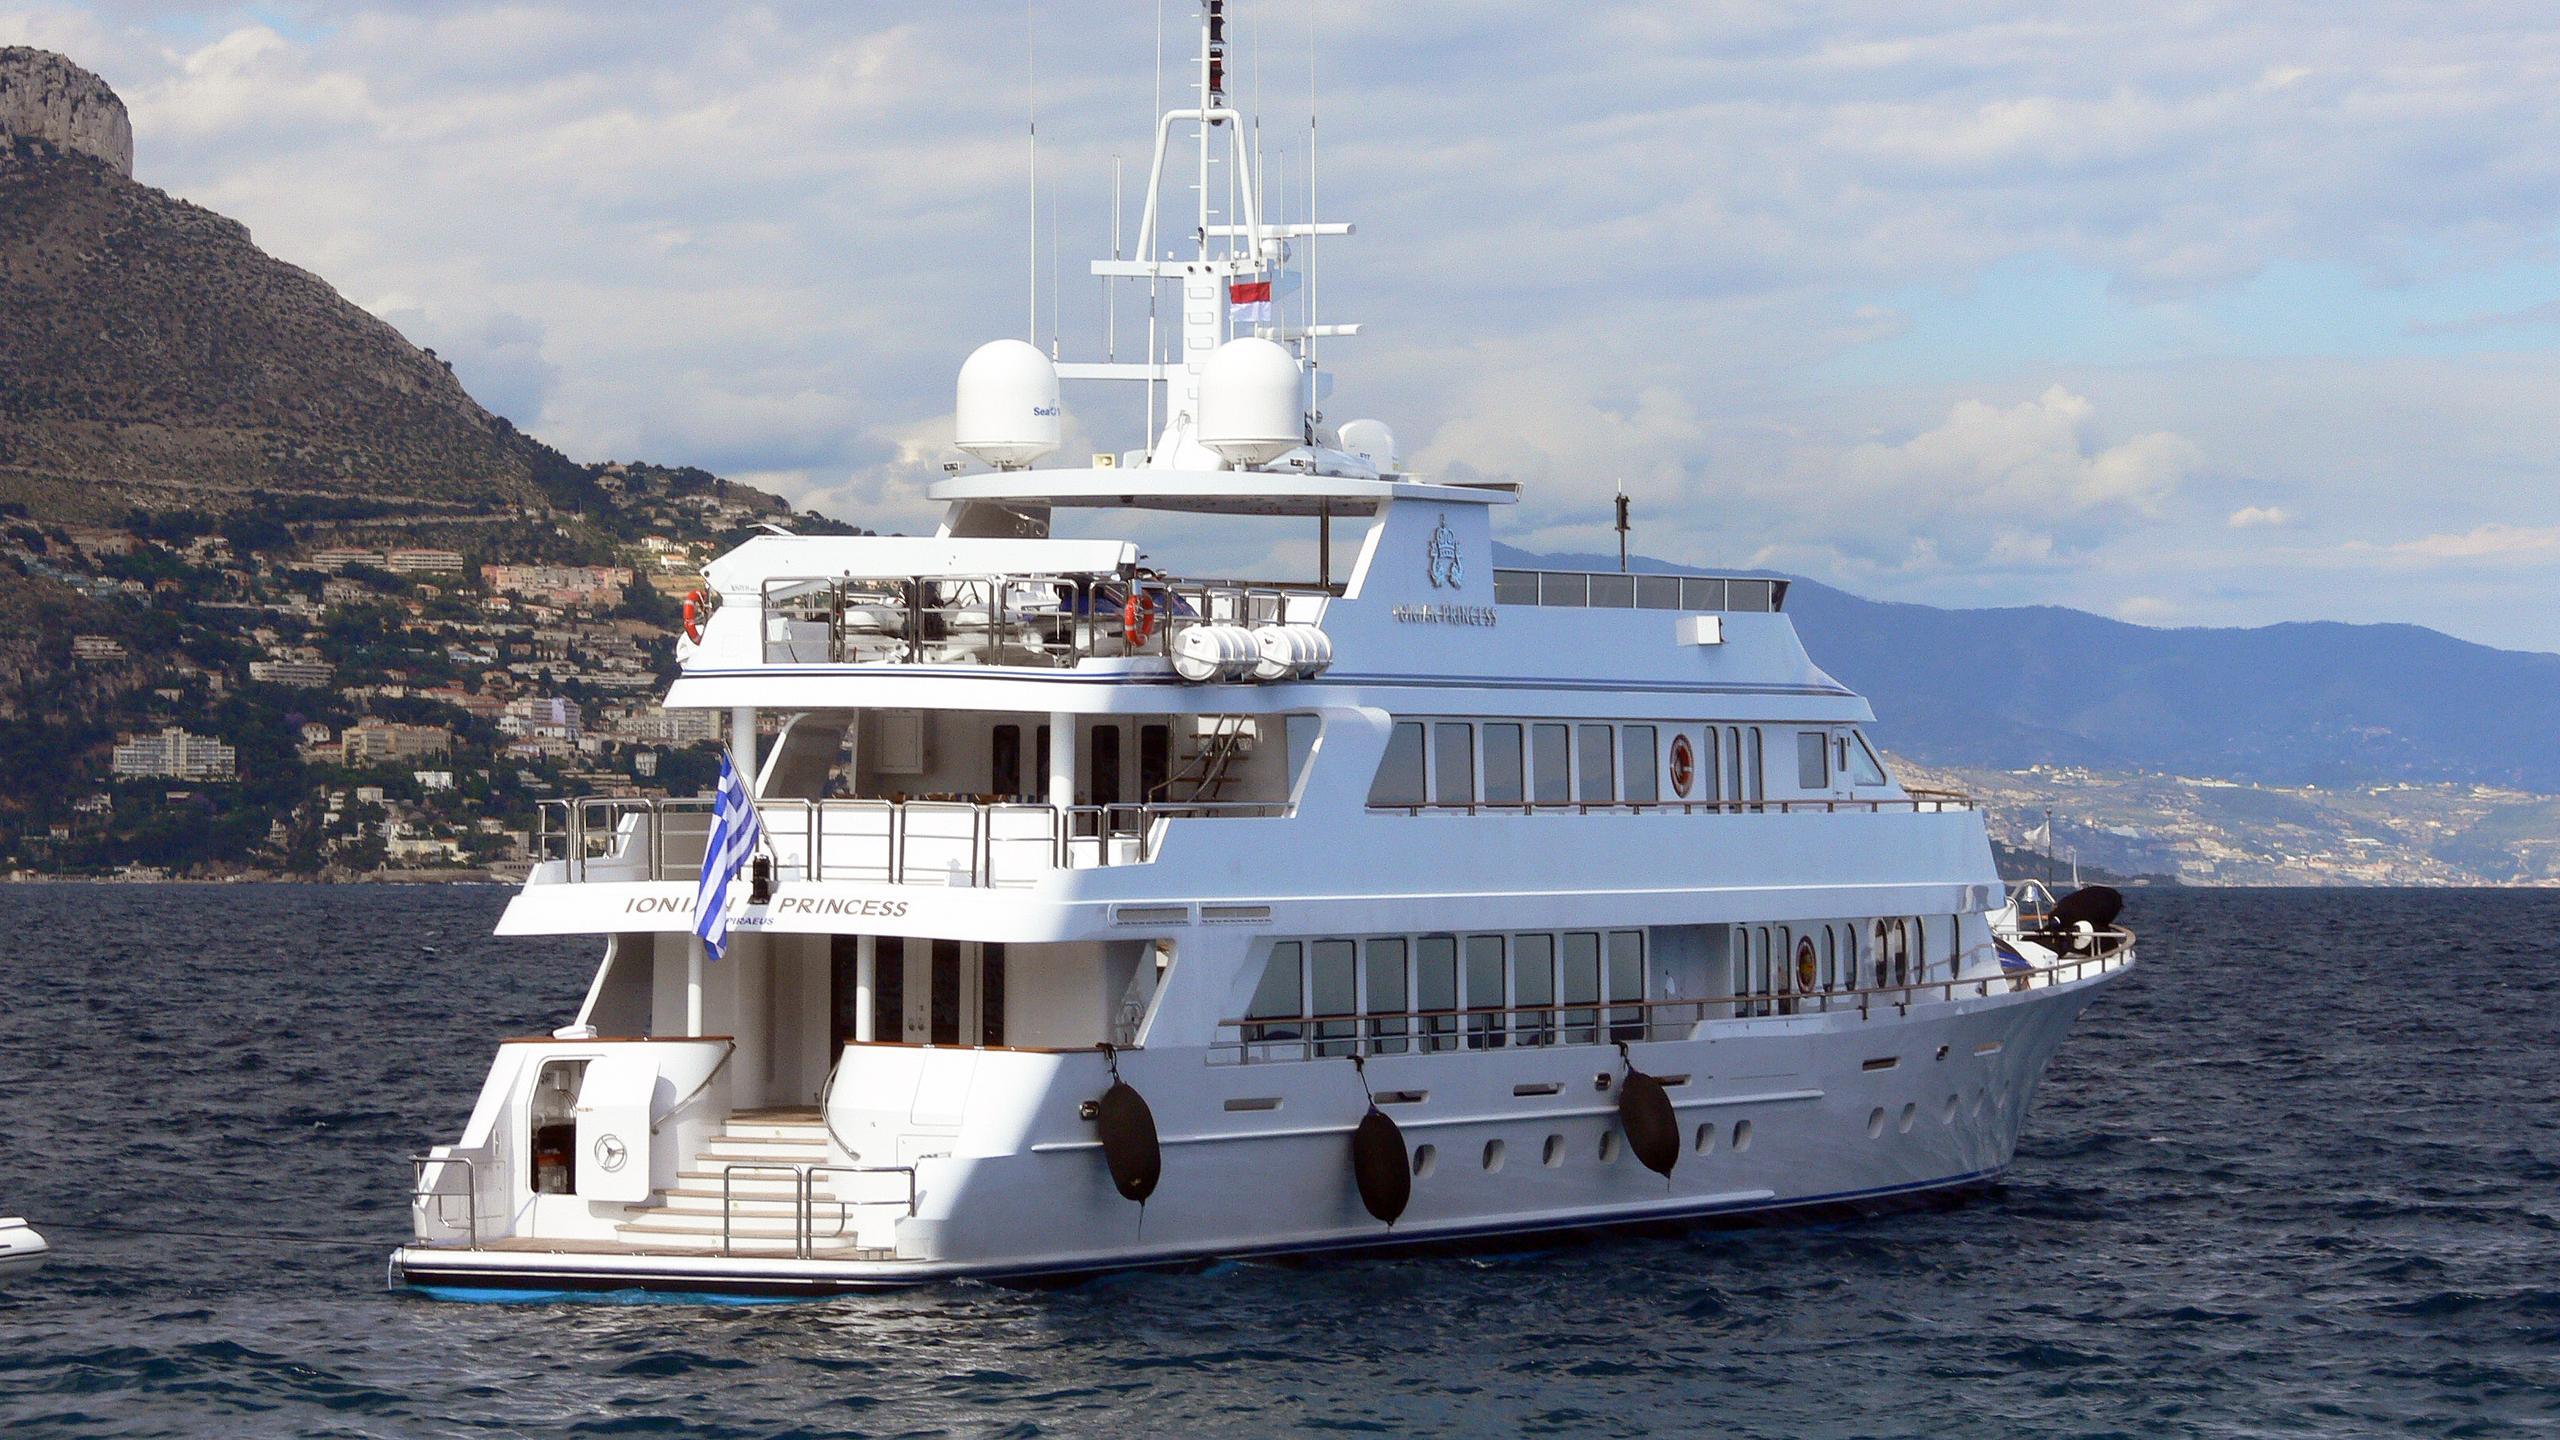 ionian-princess-motor-yacht-christensen-palmer-johnson-savannah-2005-46m-stern